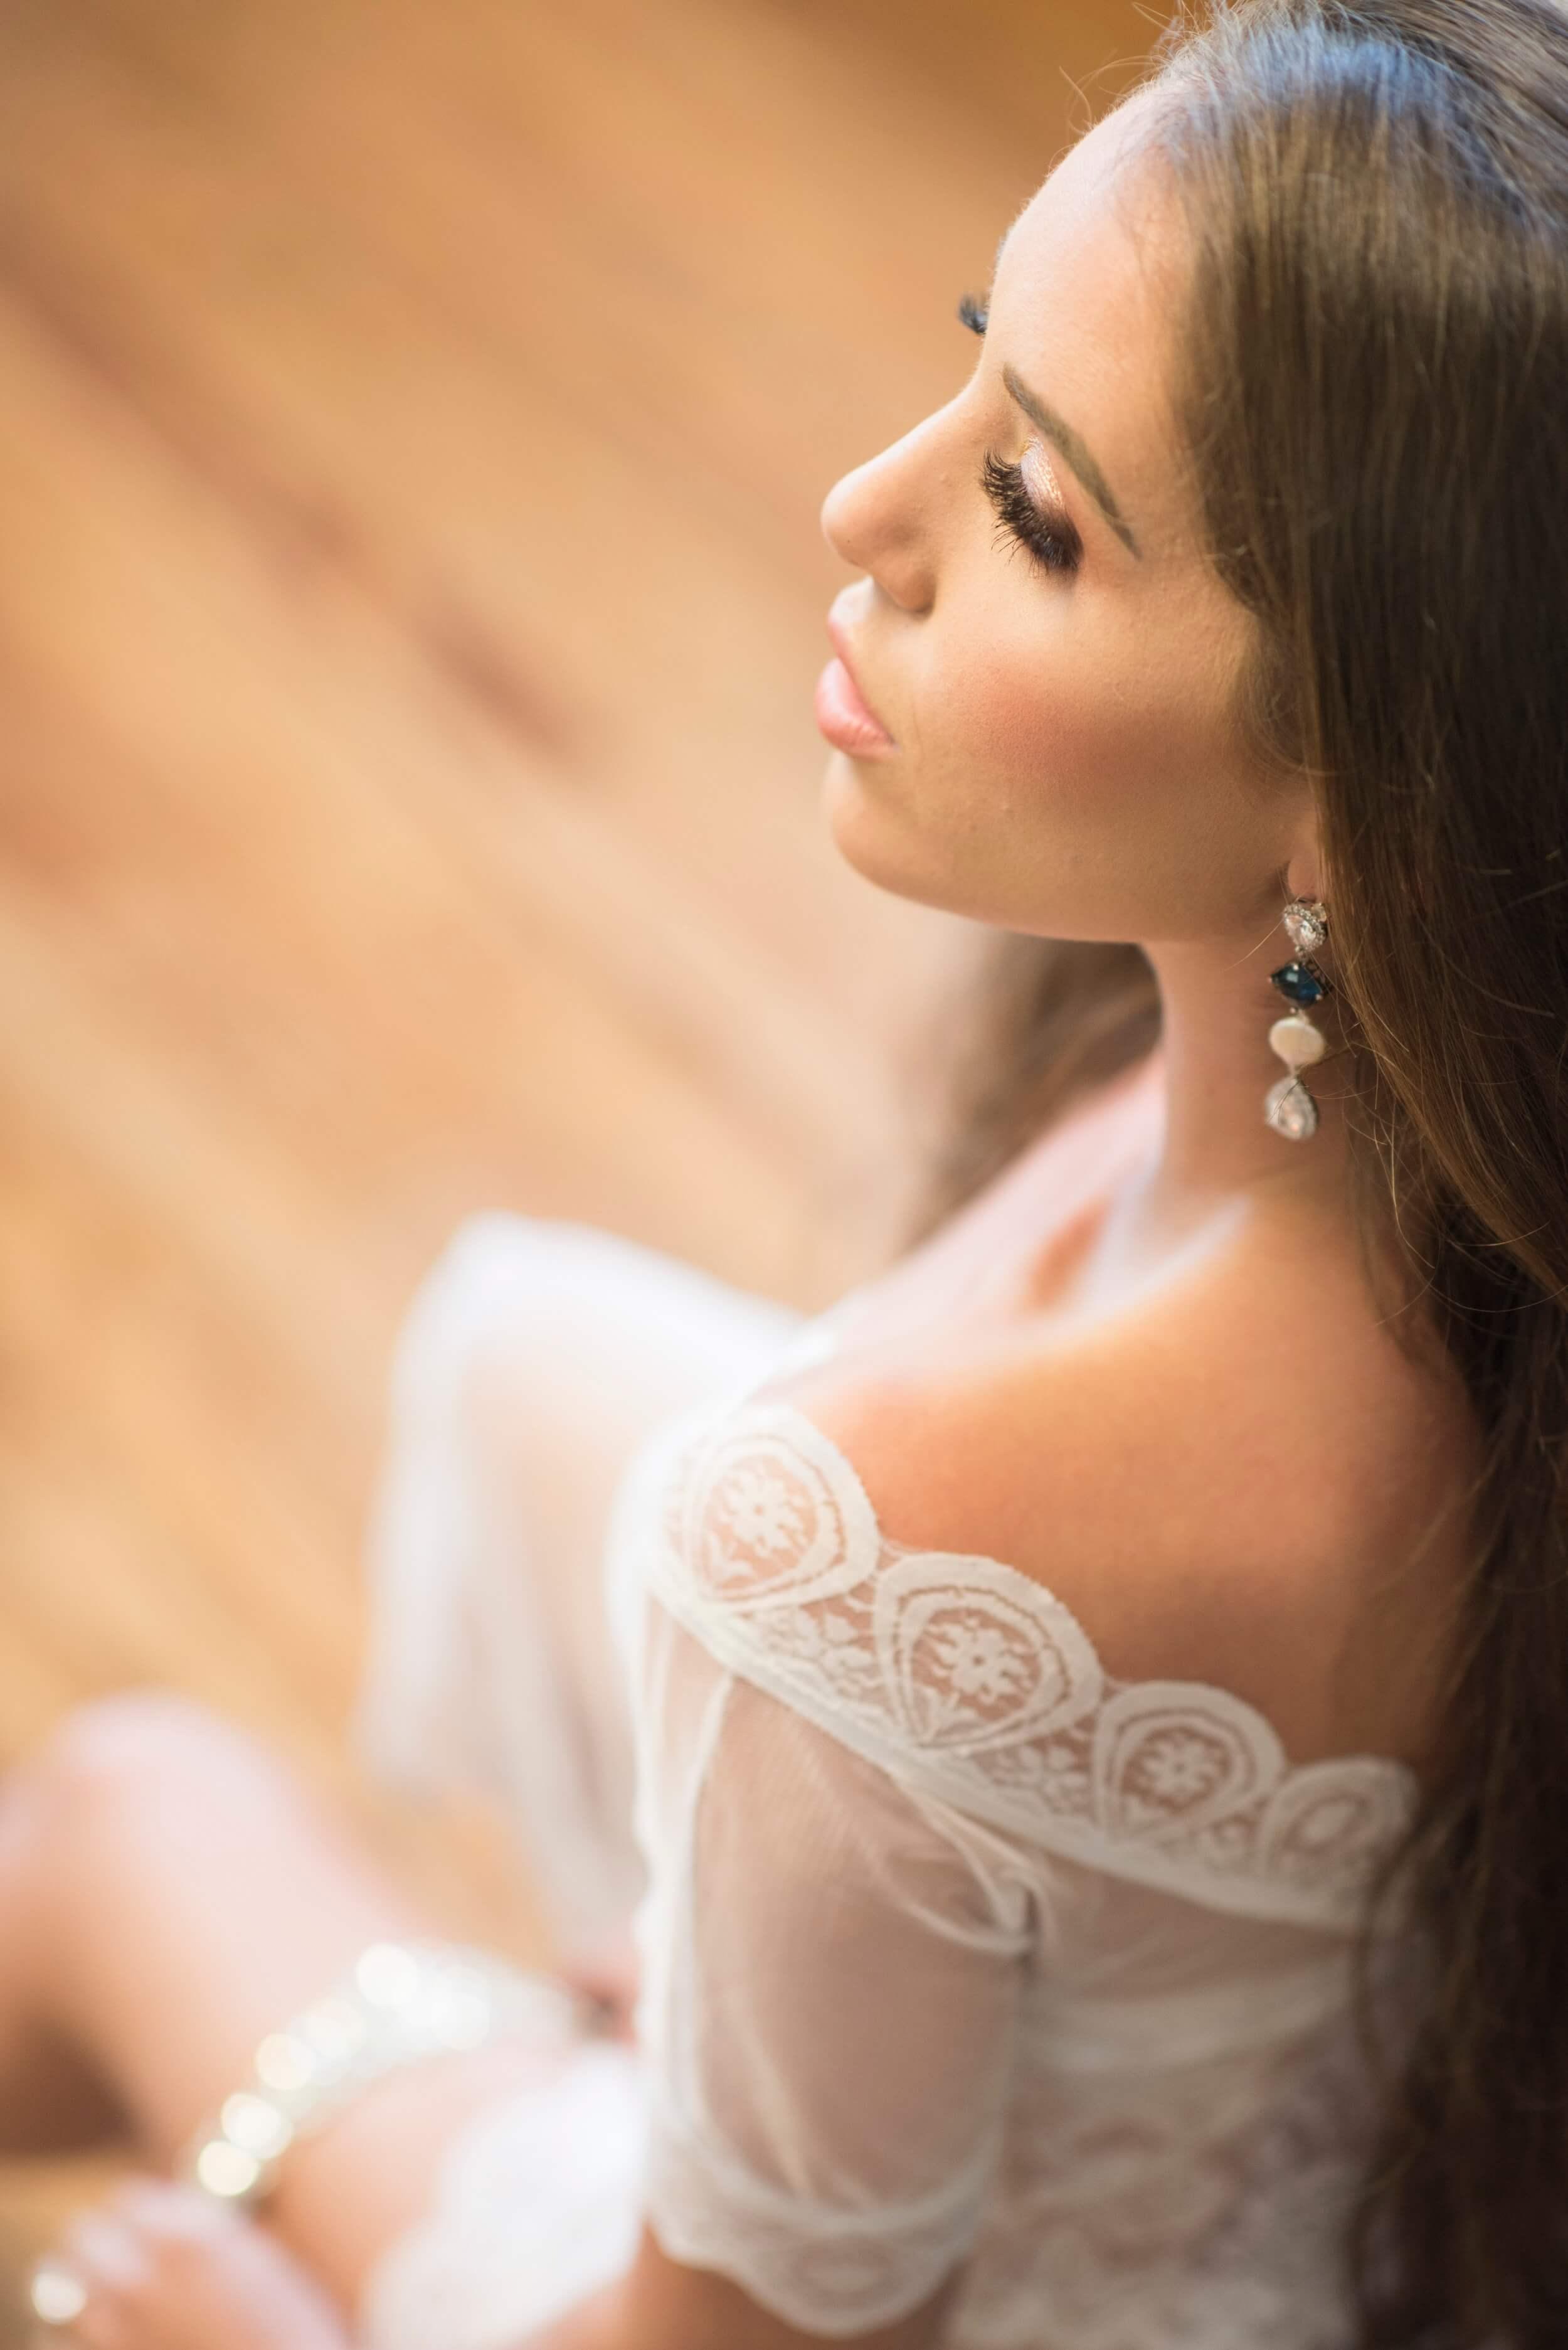 Bridal Boudoir by Graciela Valdes Photography (8).jpg